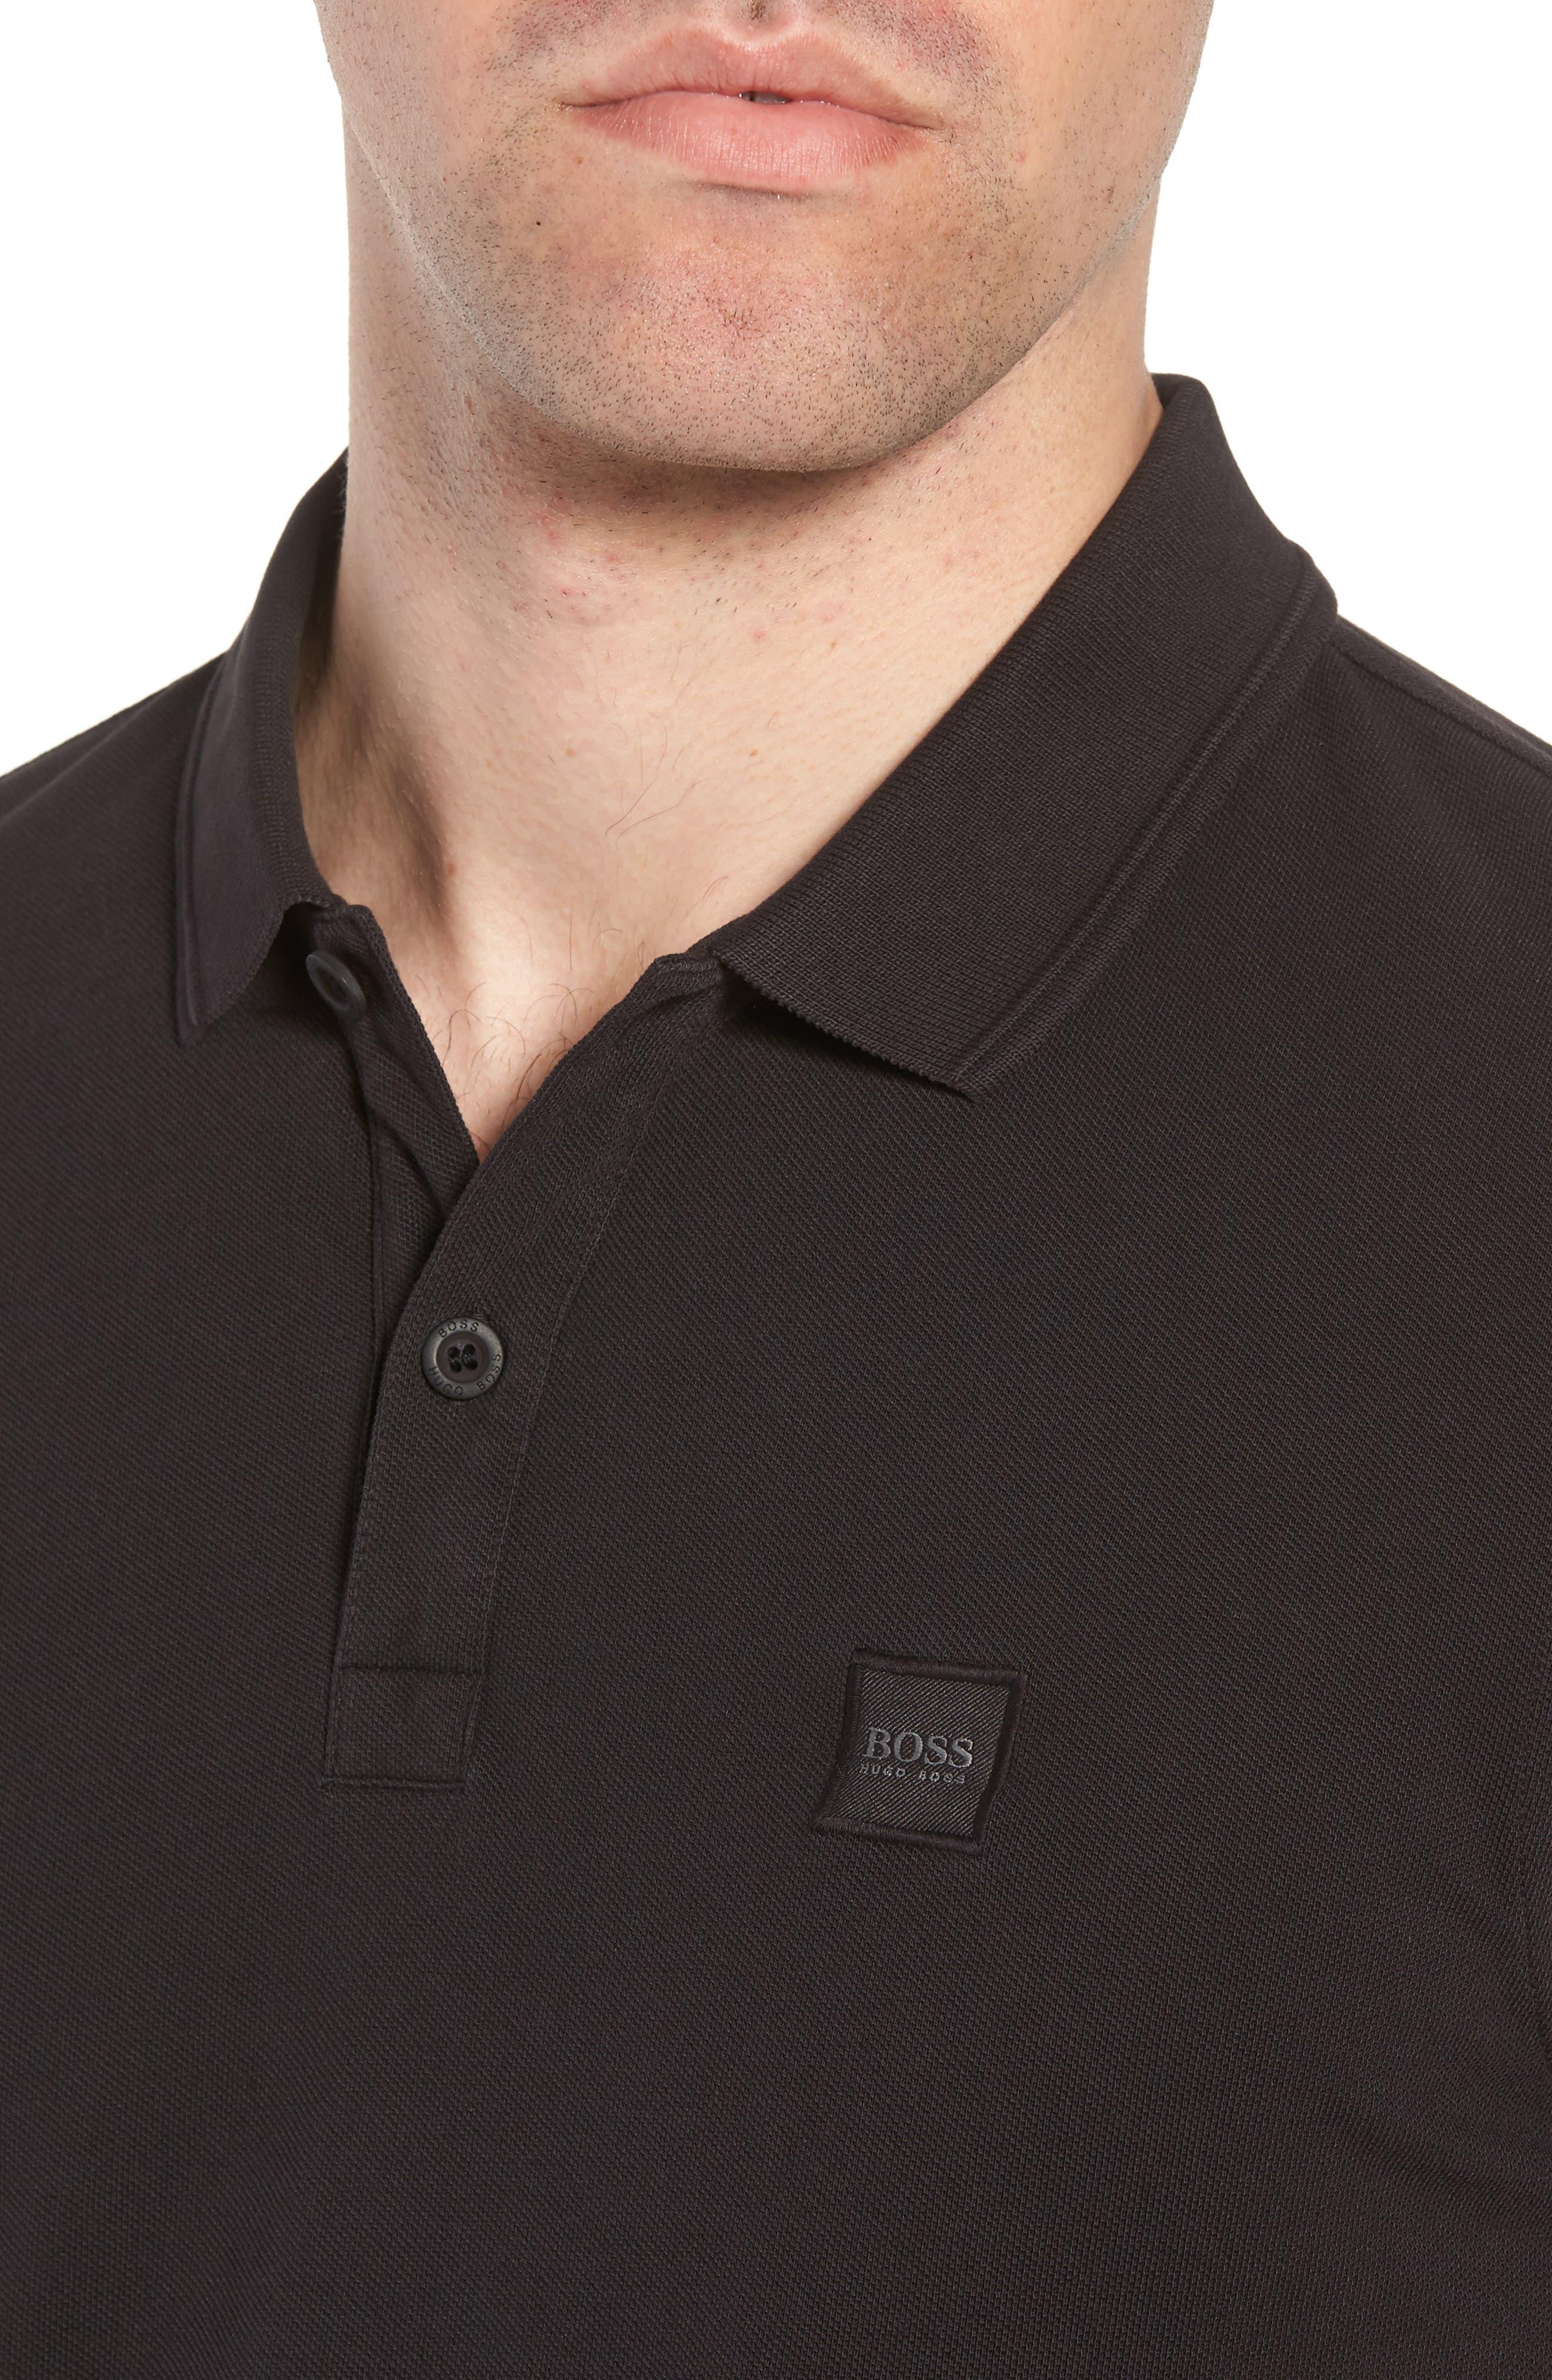 Prime Slim Fit Polo,                             Alternate thumbnail 4, color,                             Black